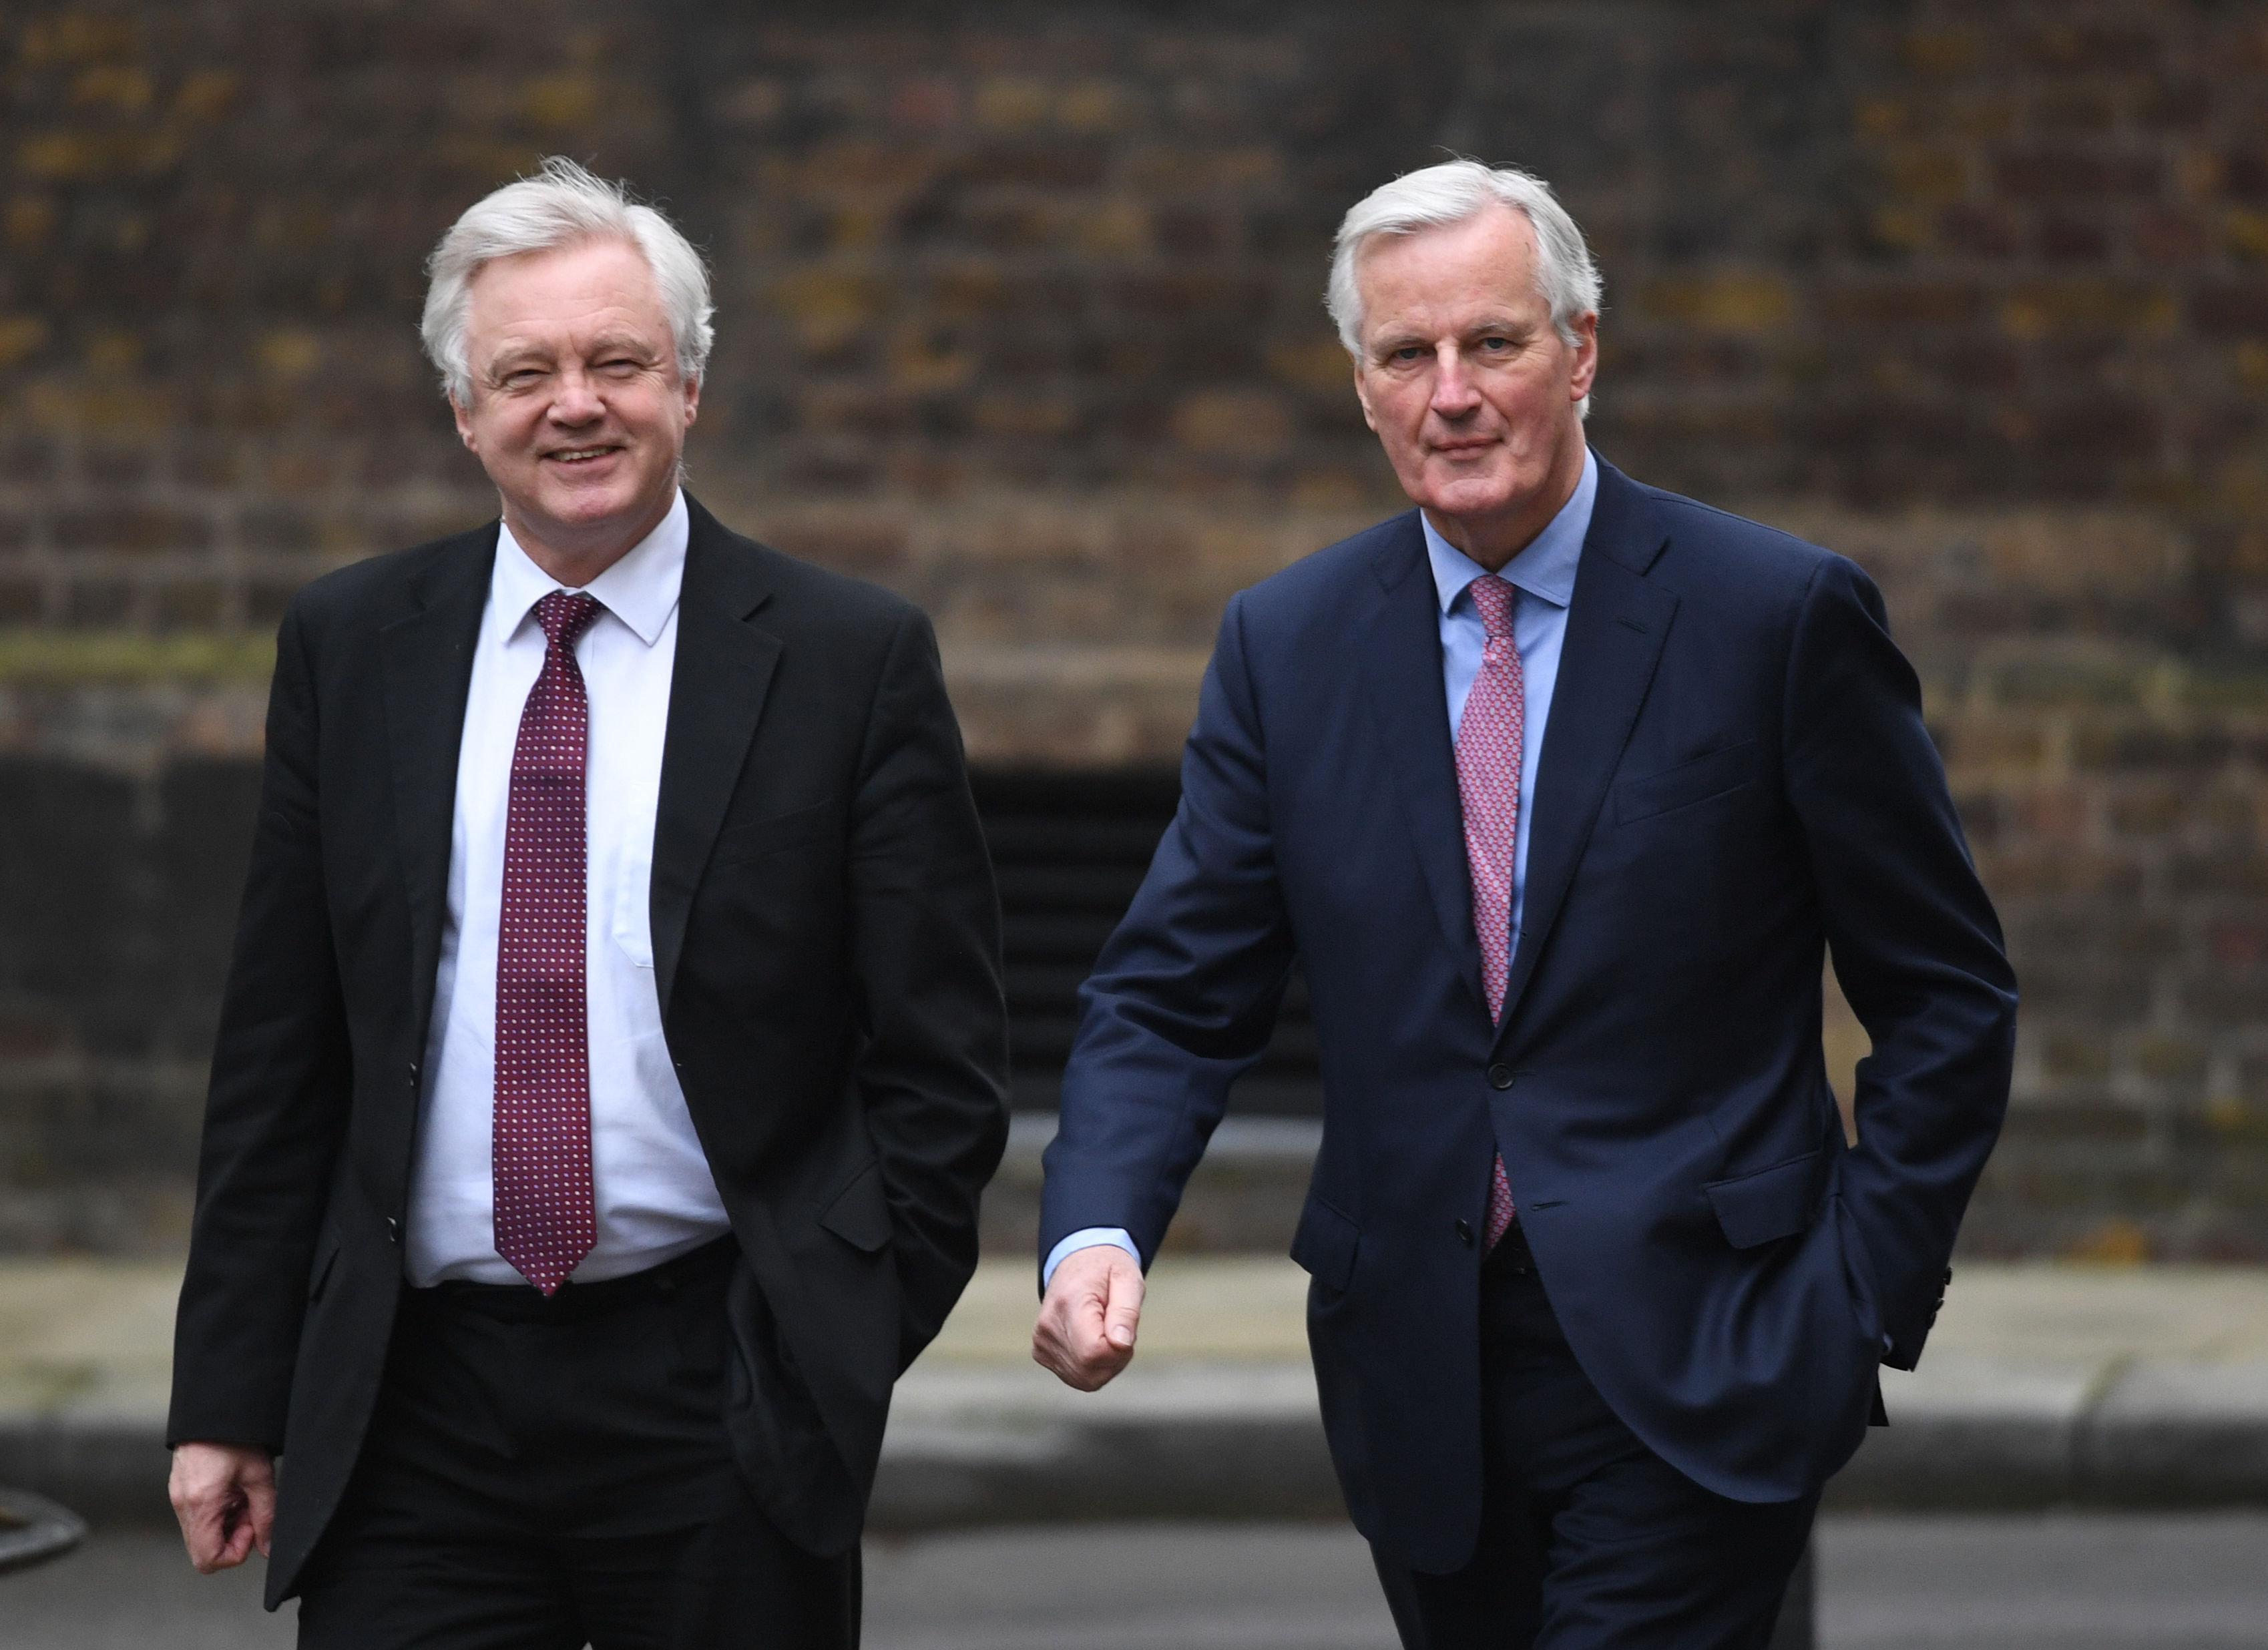 David Davis and EU negotiator Michel Barnier